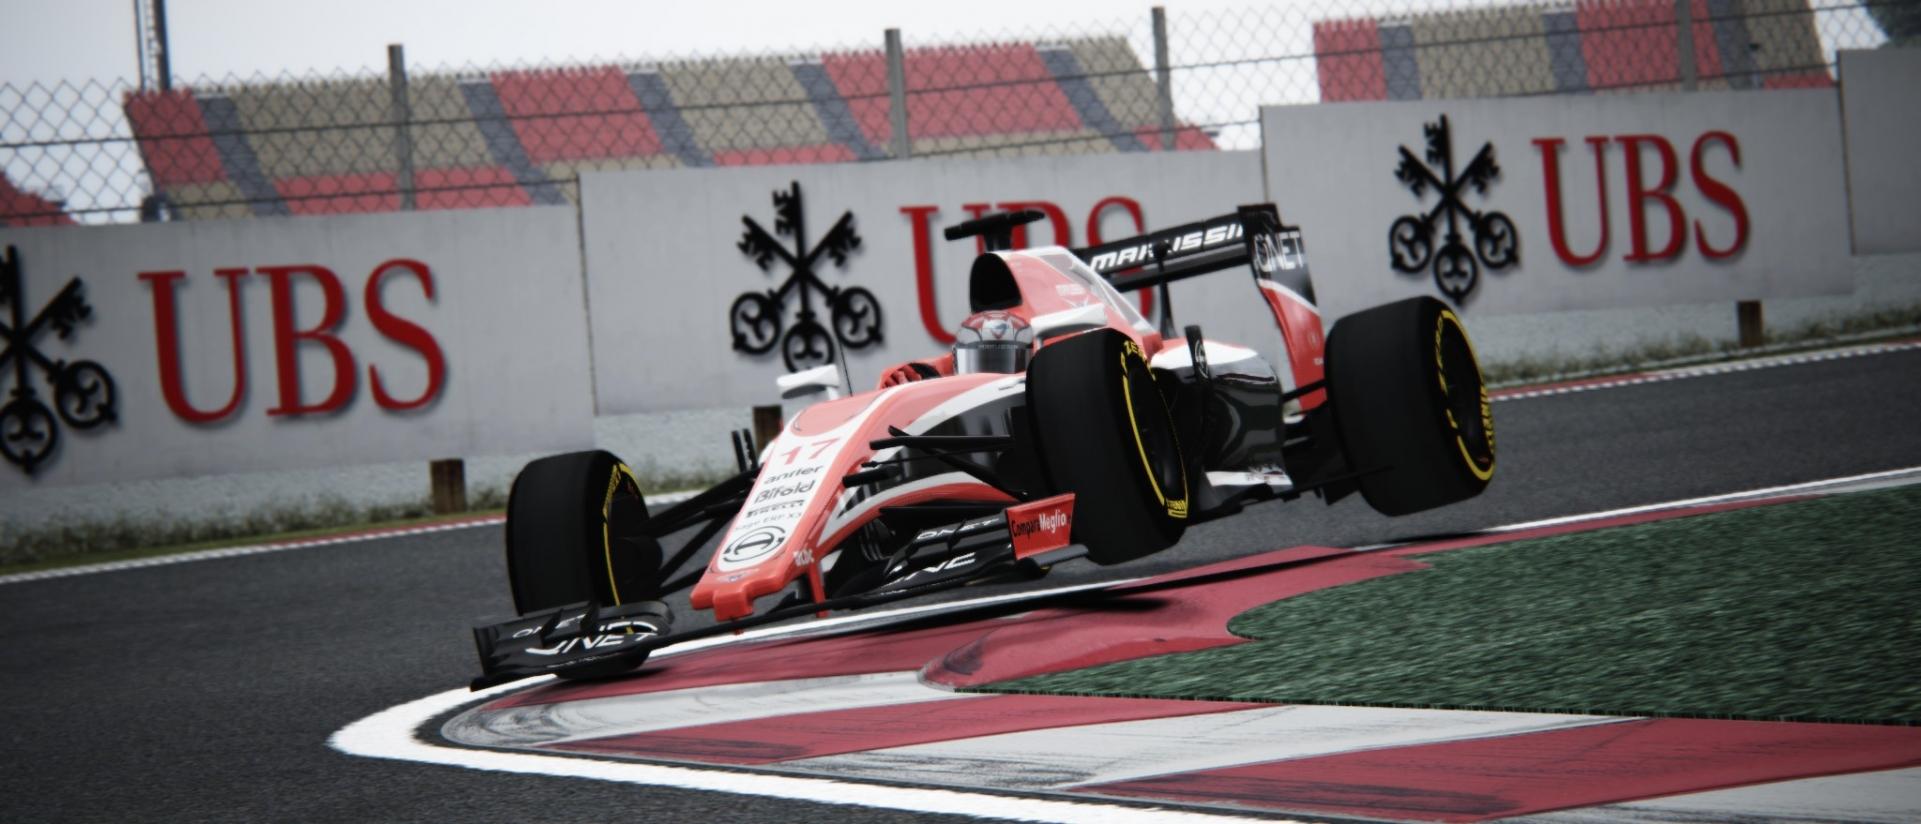 Assetto Corsa - ACFL F1 2015 Catalunya 12